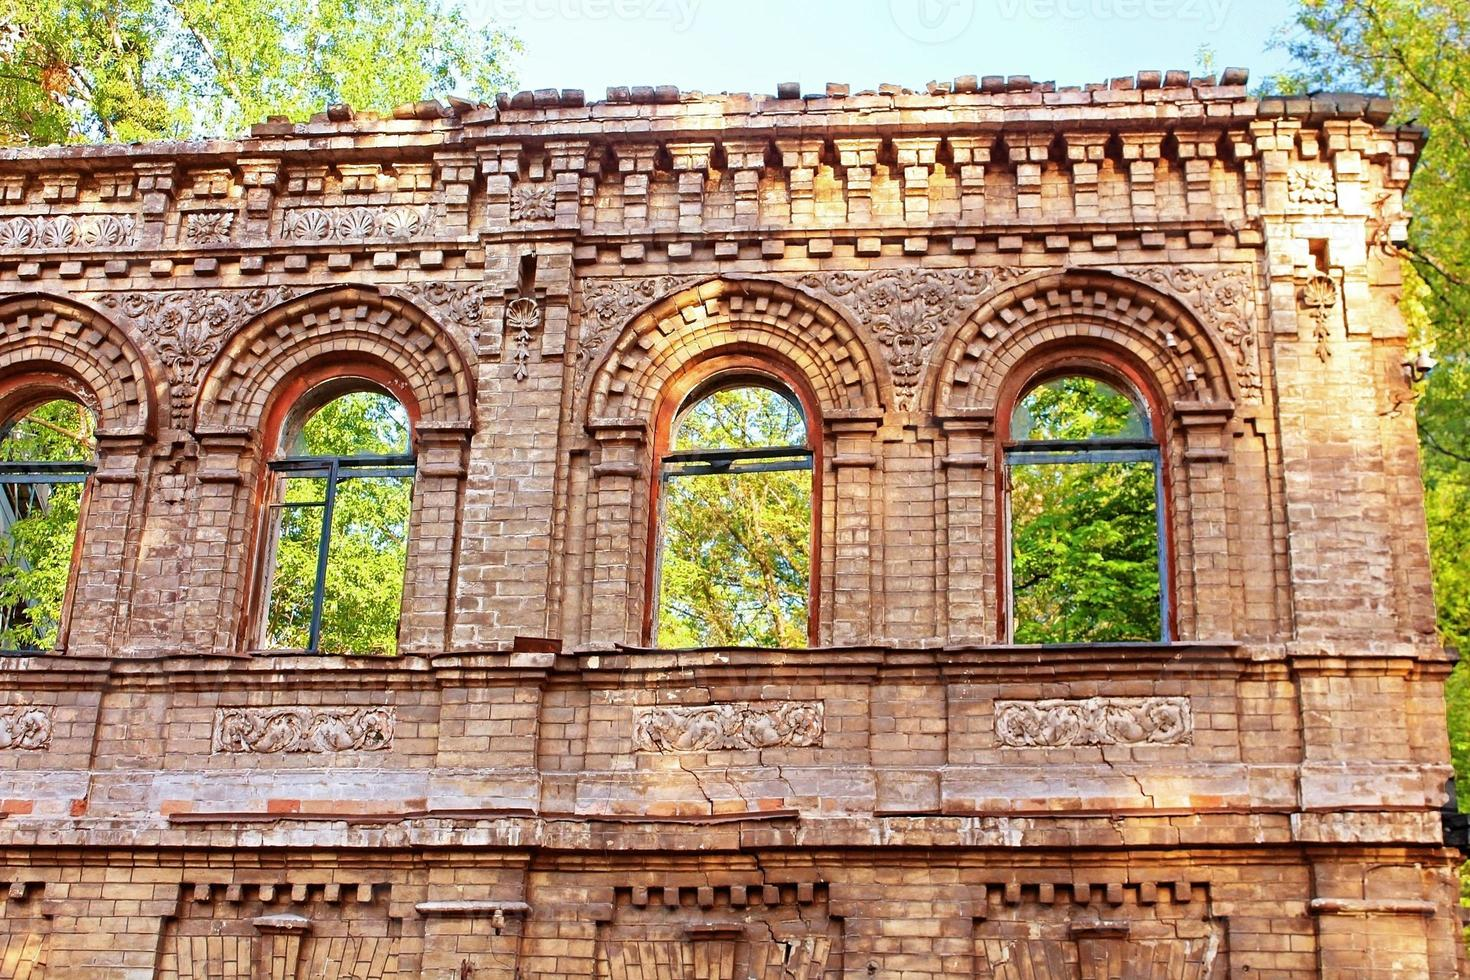 Ruined old building, Kyiv, Ukraine photo